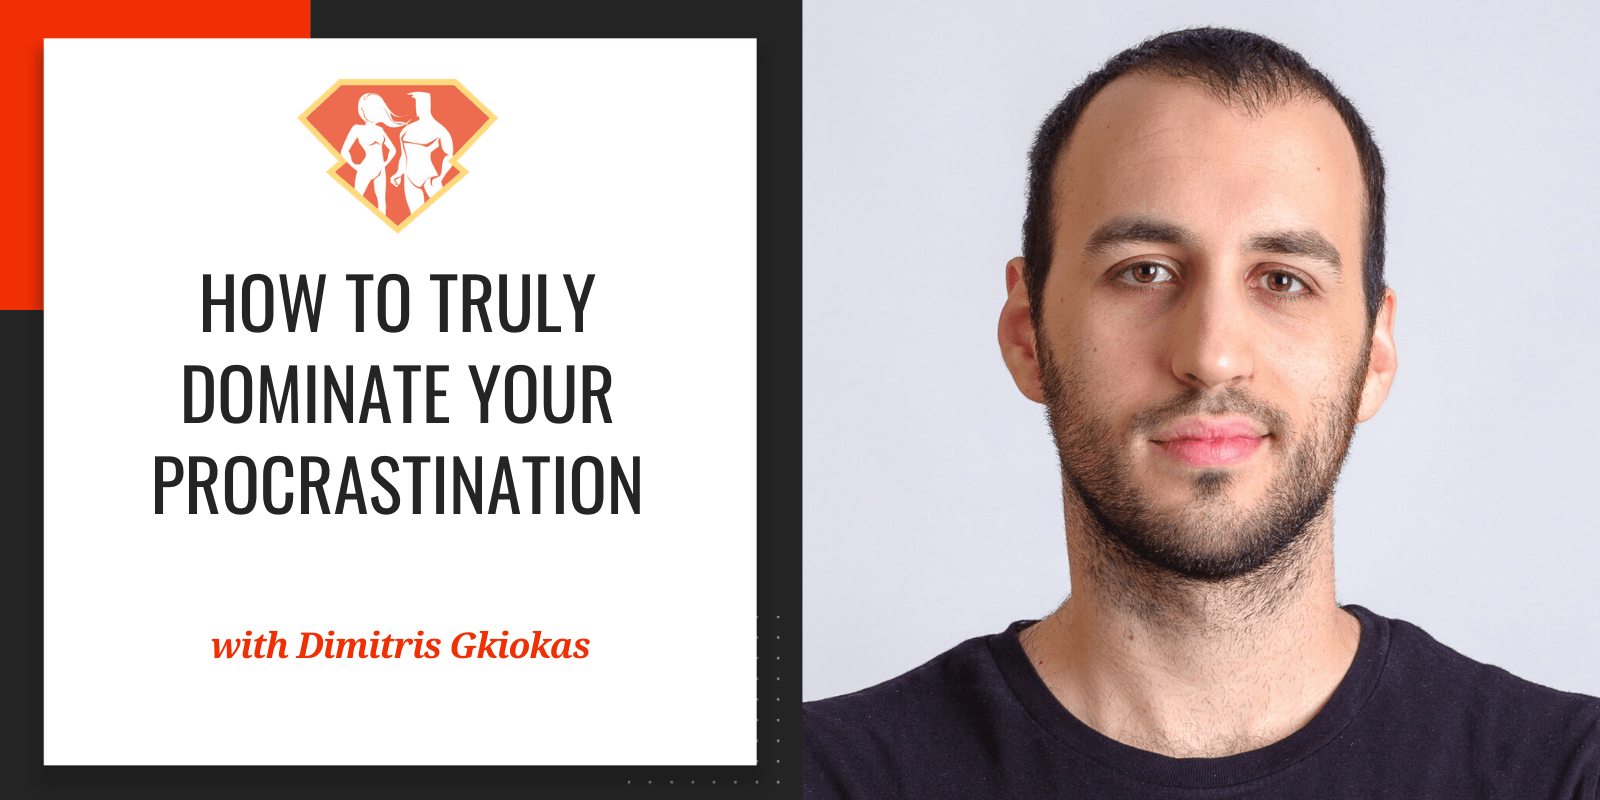 How To Truly Dominate Your Procrastination With Dimitris Gkiokas